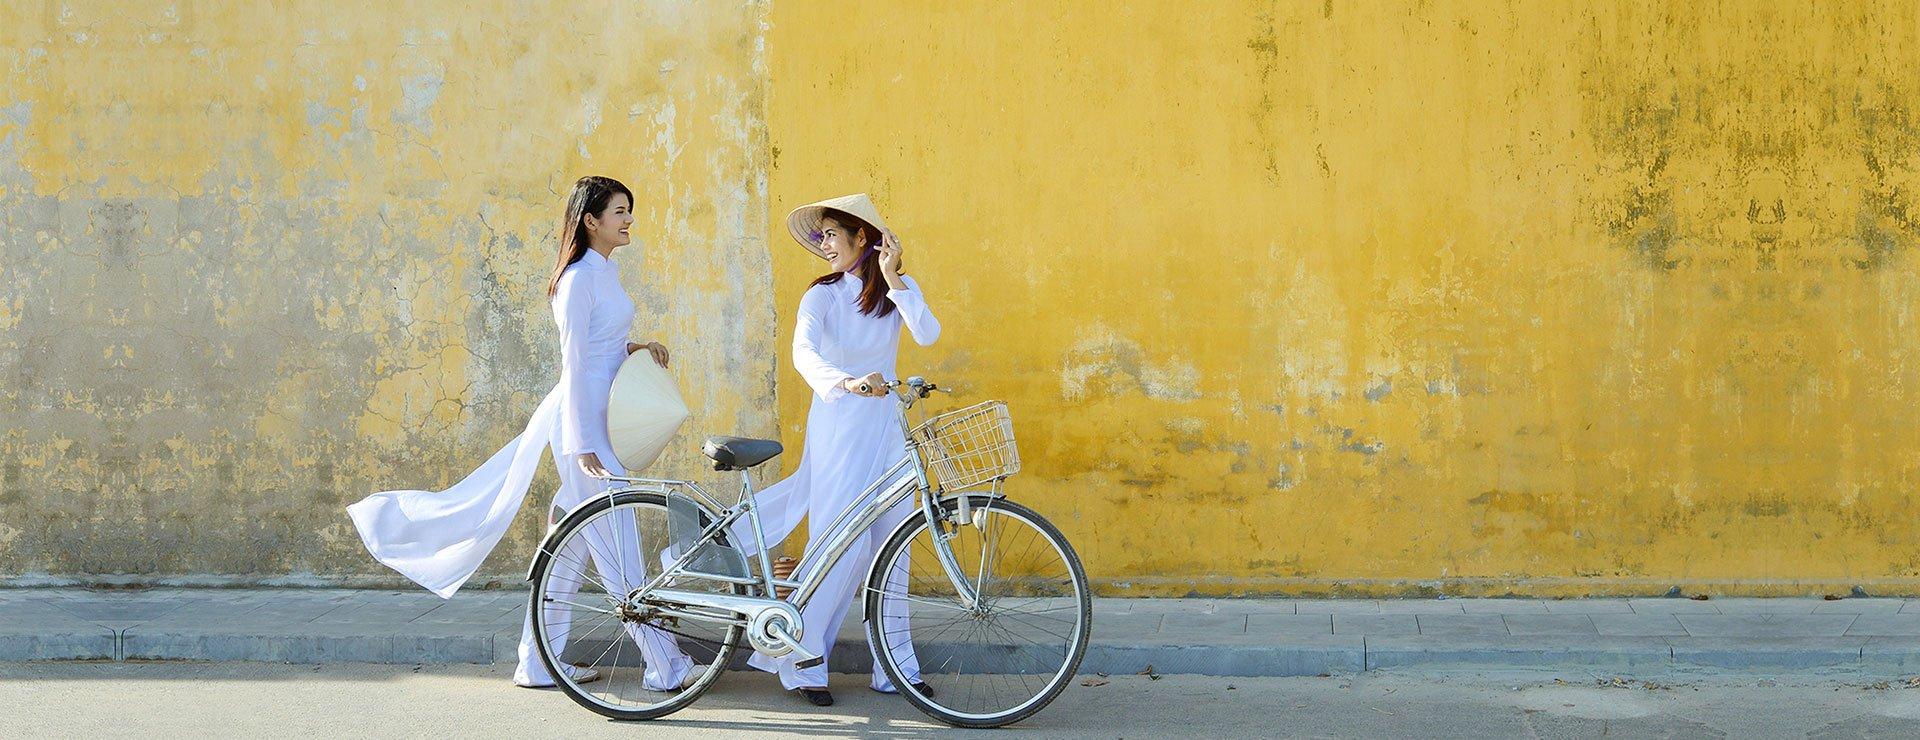 Top 5 lugares imperdibles en Dalat, Vietnam